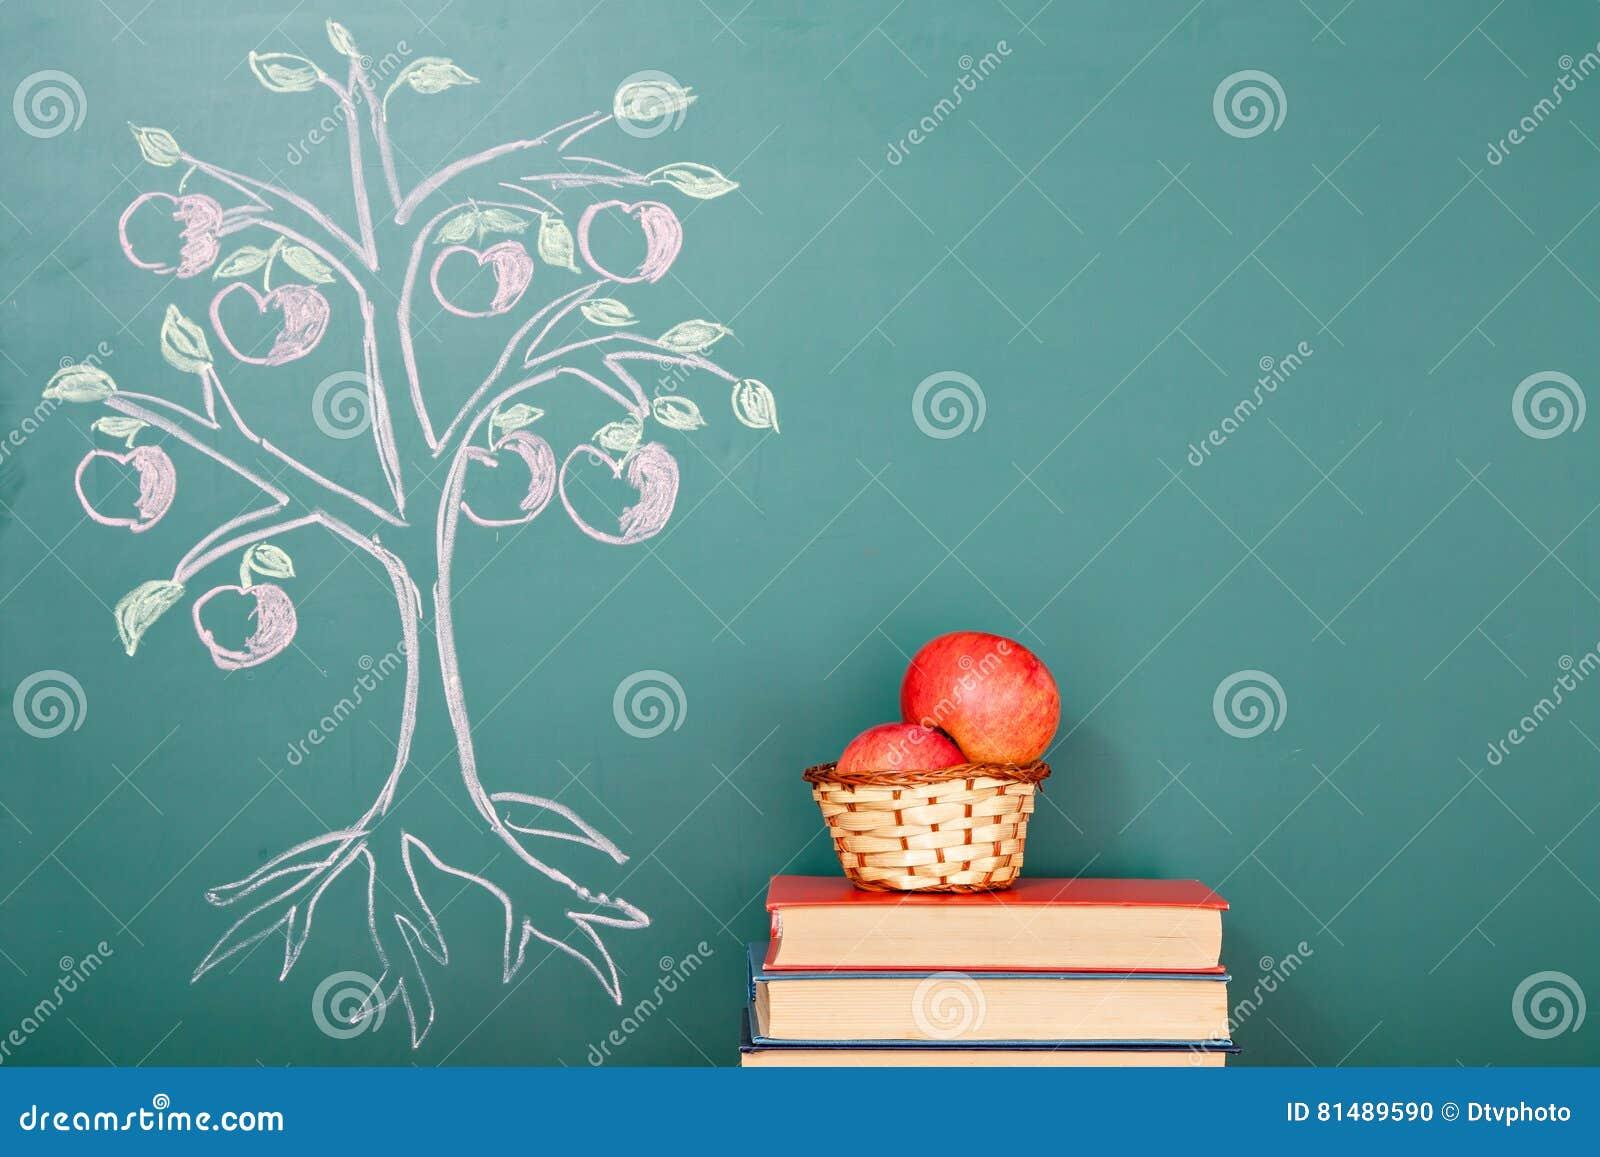 Дерево знания